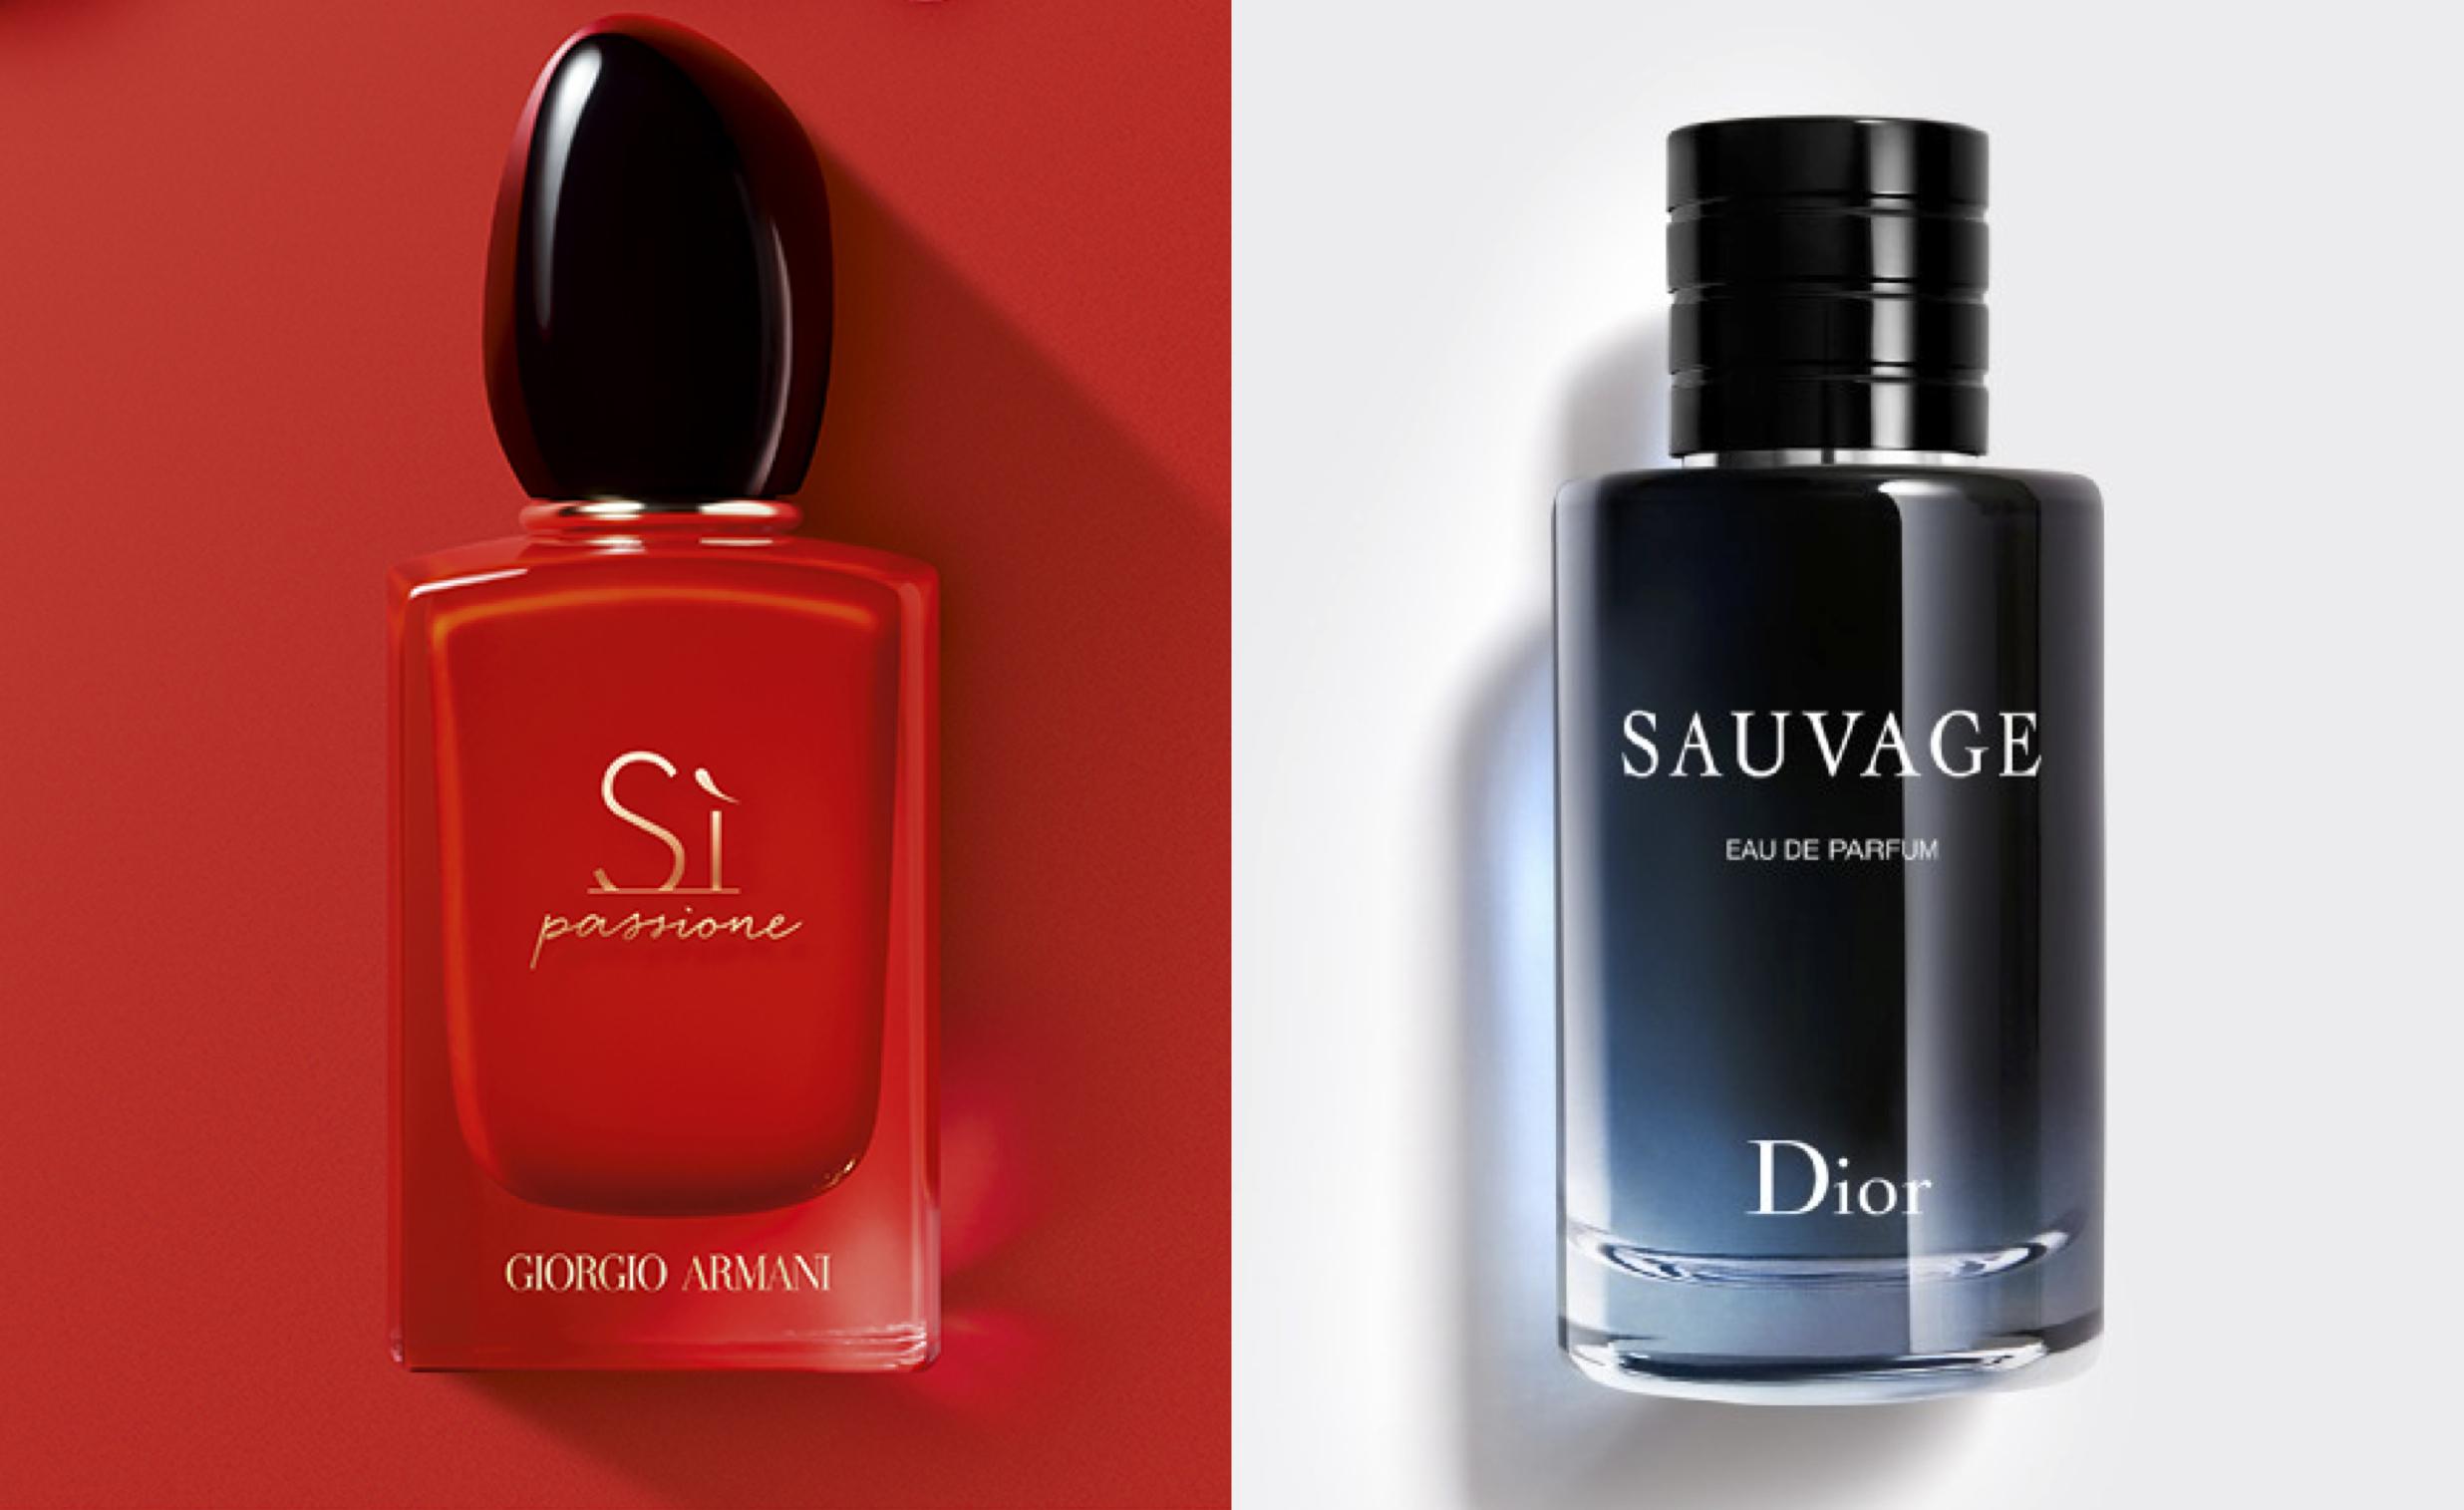 Giorgio Armani's Sì Passione and Dior Sauvage Eau de Parfum.